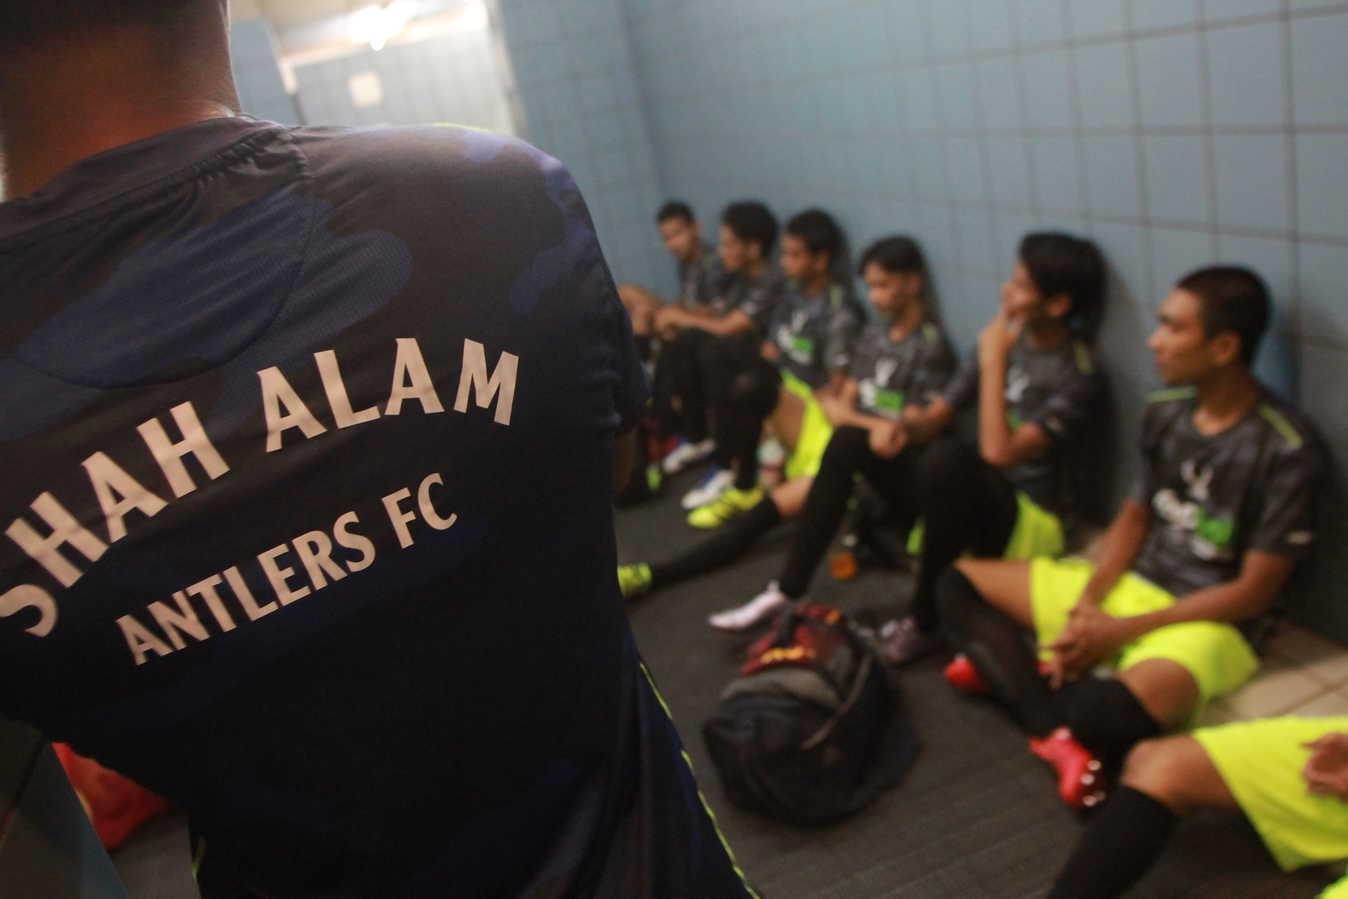 Shah Alam Antlers FC: Gabungan Idea Freiburg, Kashima & Western Sydney Wanderers